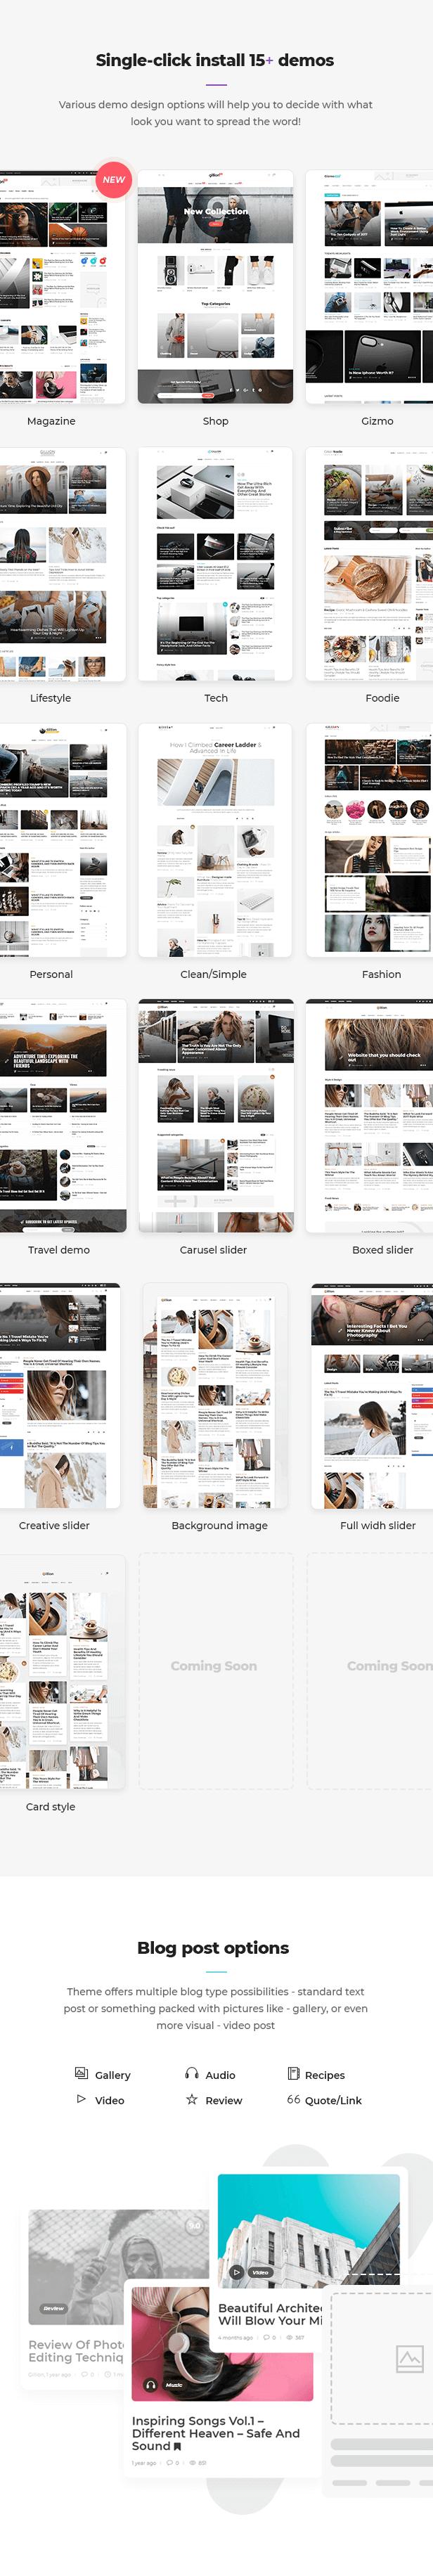 showcase2 - Gillion | Multi-Concept Blog/Magazine & Shop WordPress AMP Theme